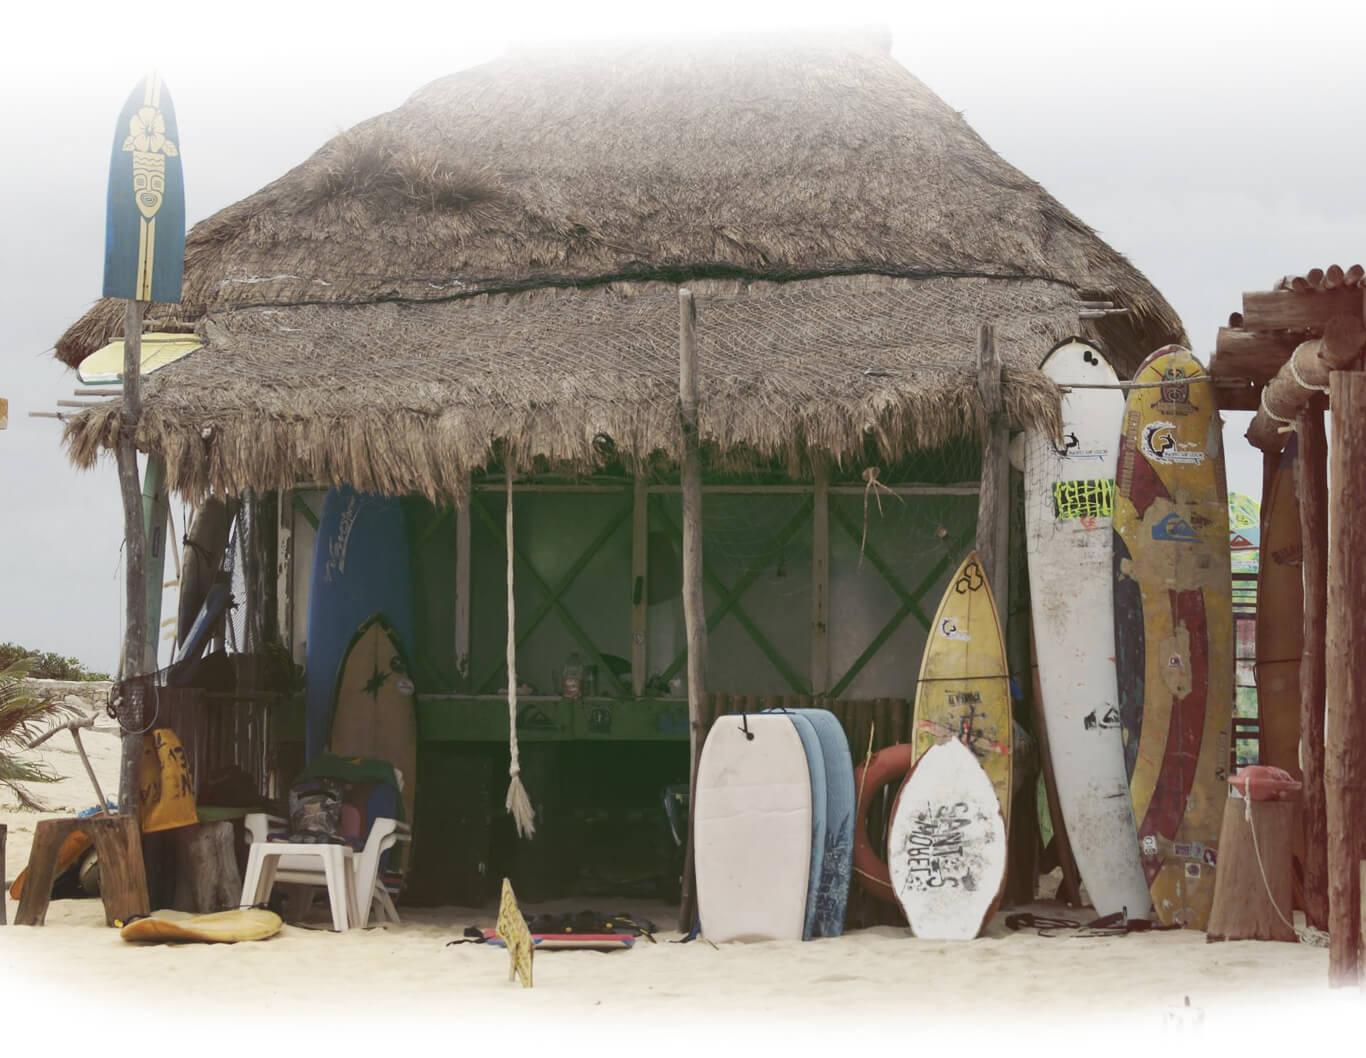 Cozumel My Cozumel surf lessons